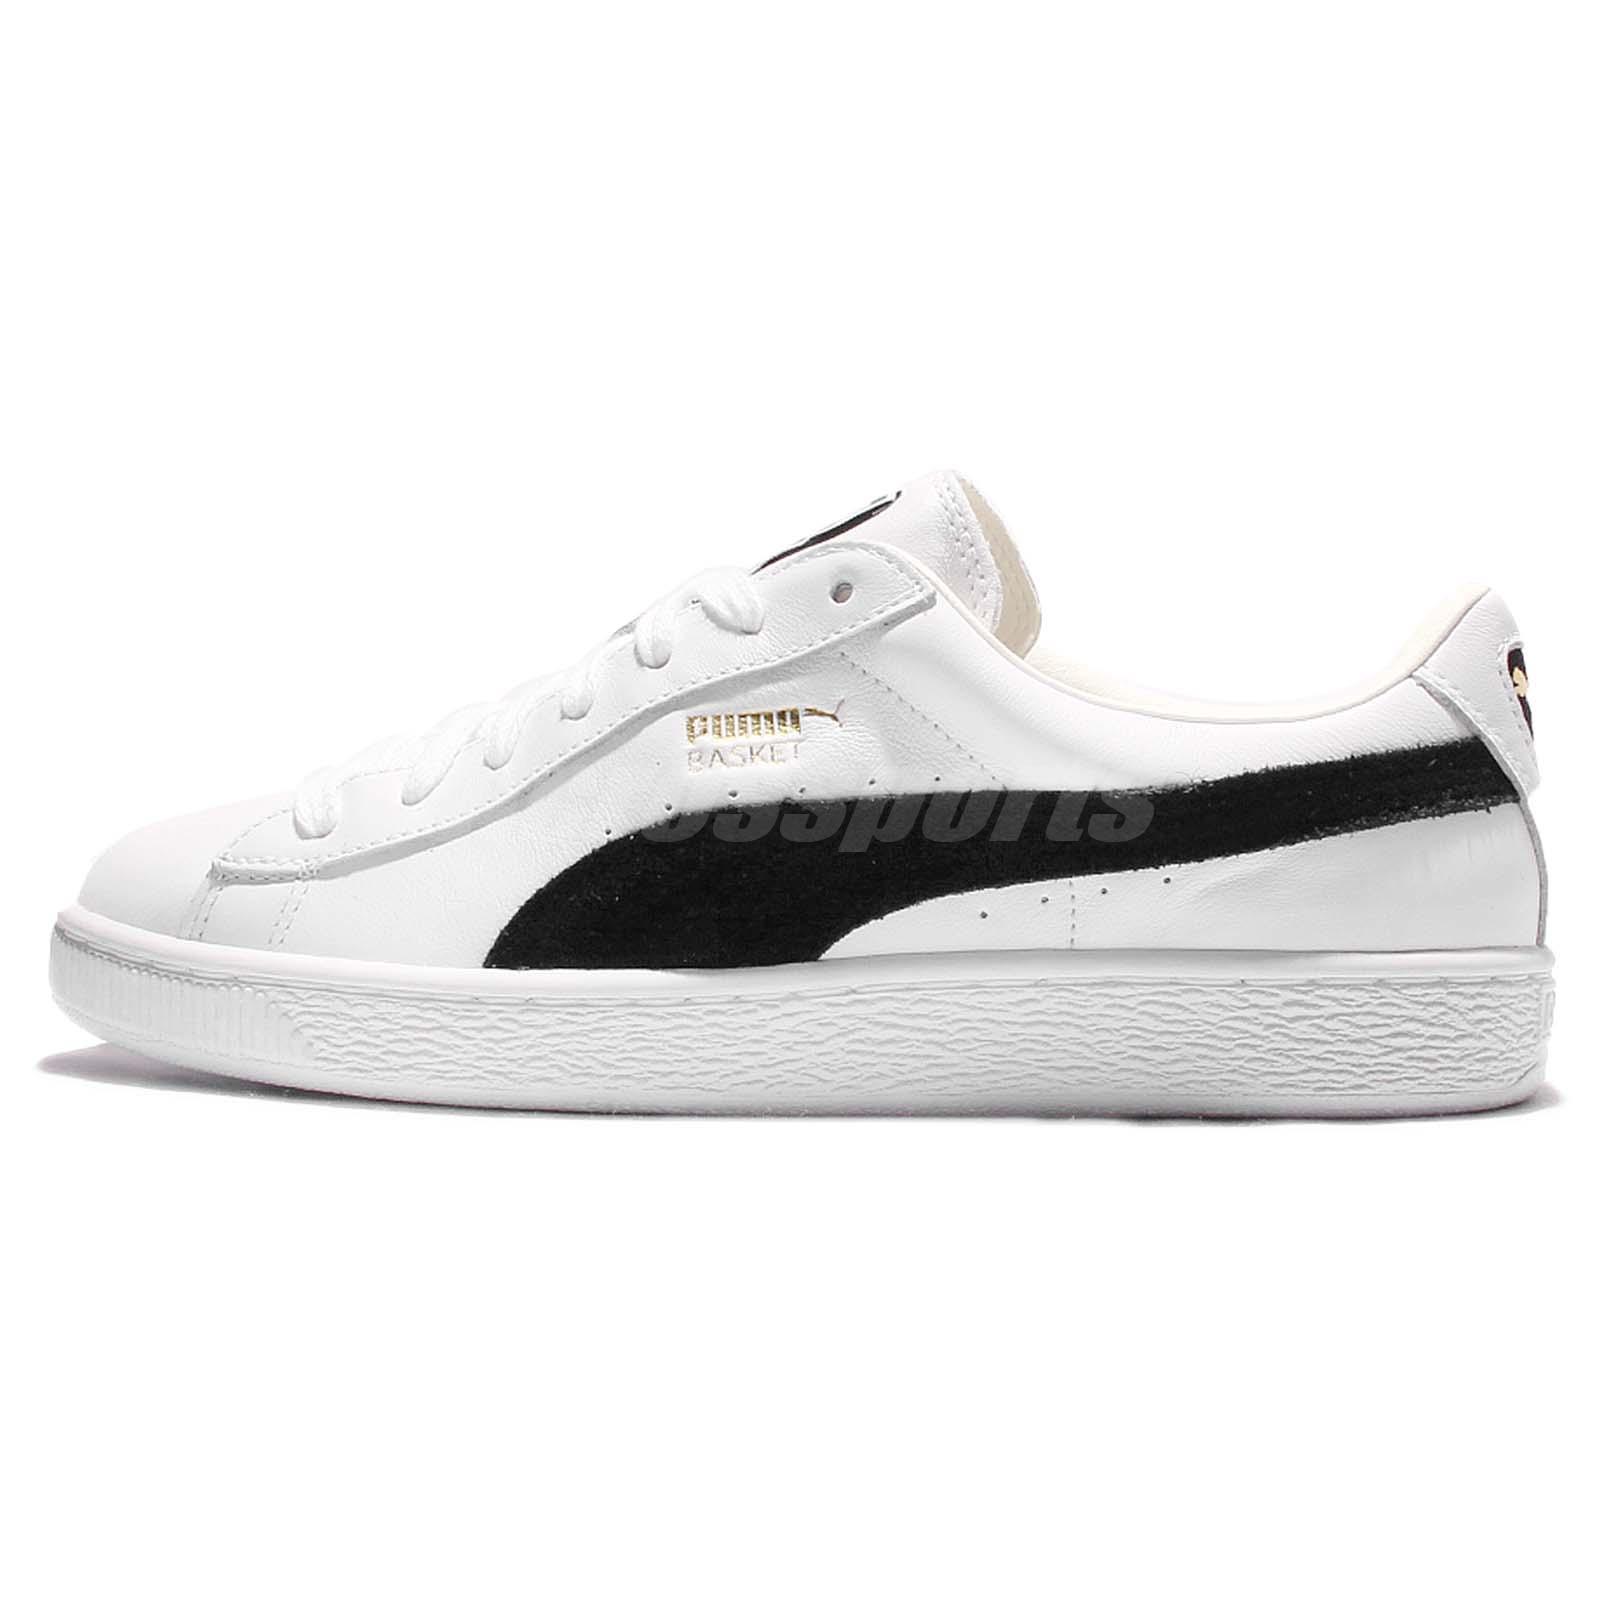 Puma Basket White Black